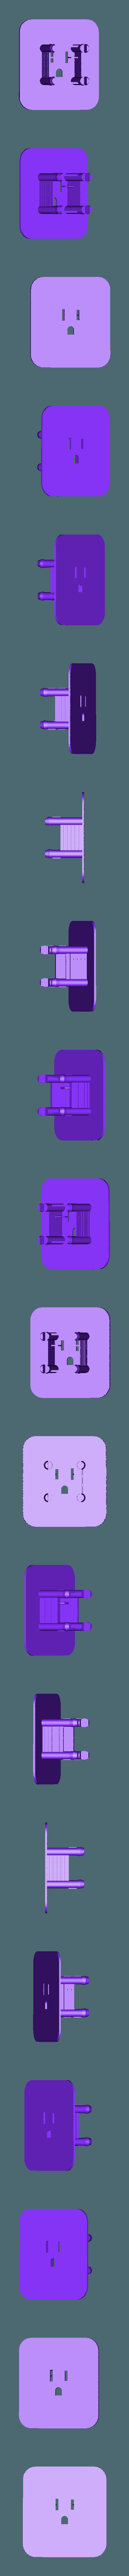 ACadaptWplateNF.stl Download free STL file AC Adapter Organizer • 3D printer design, Obenottr3D